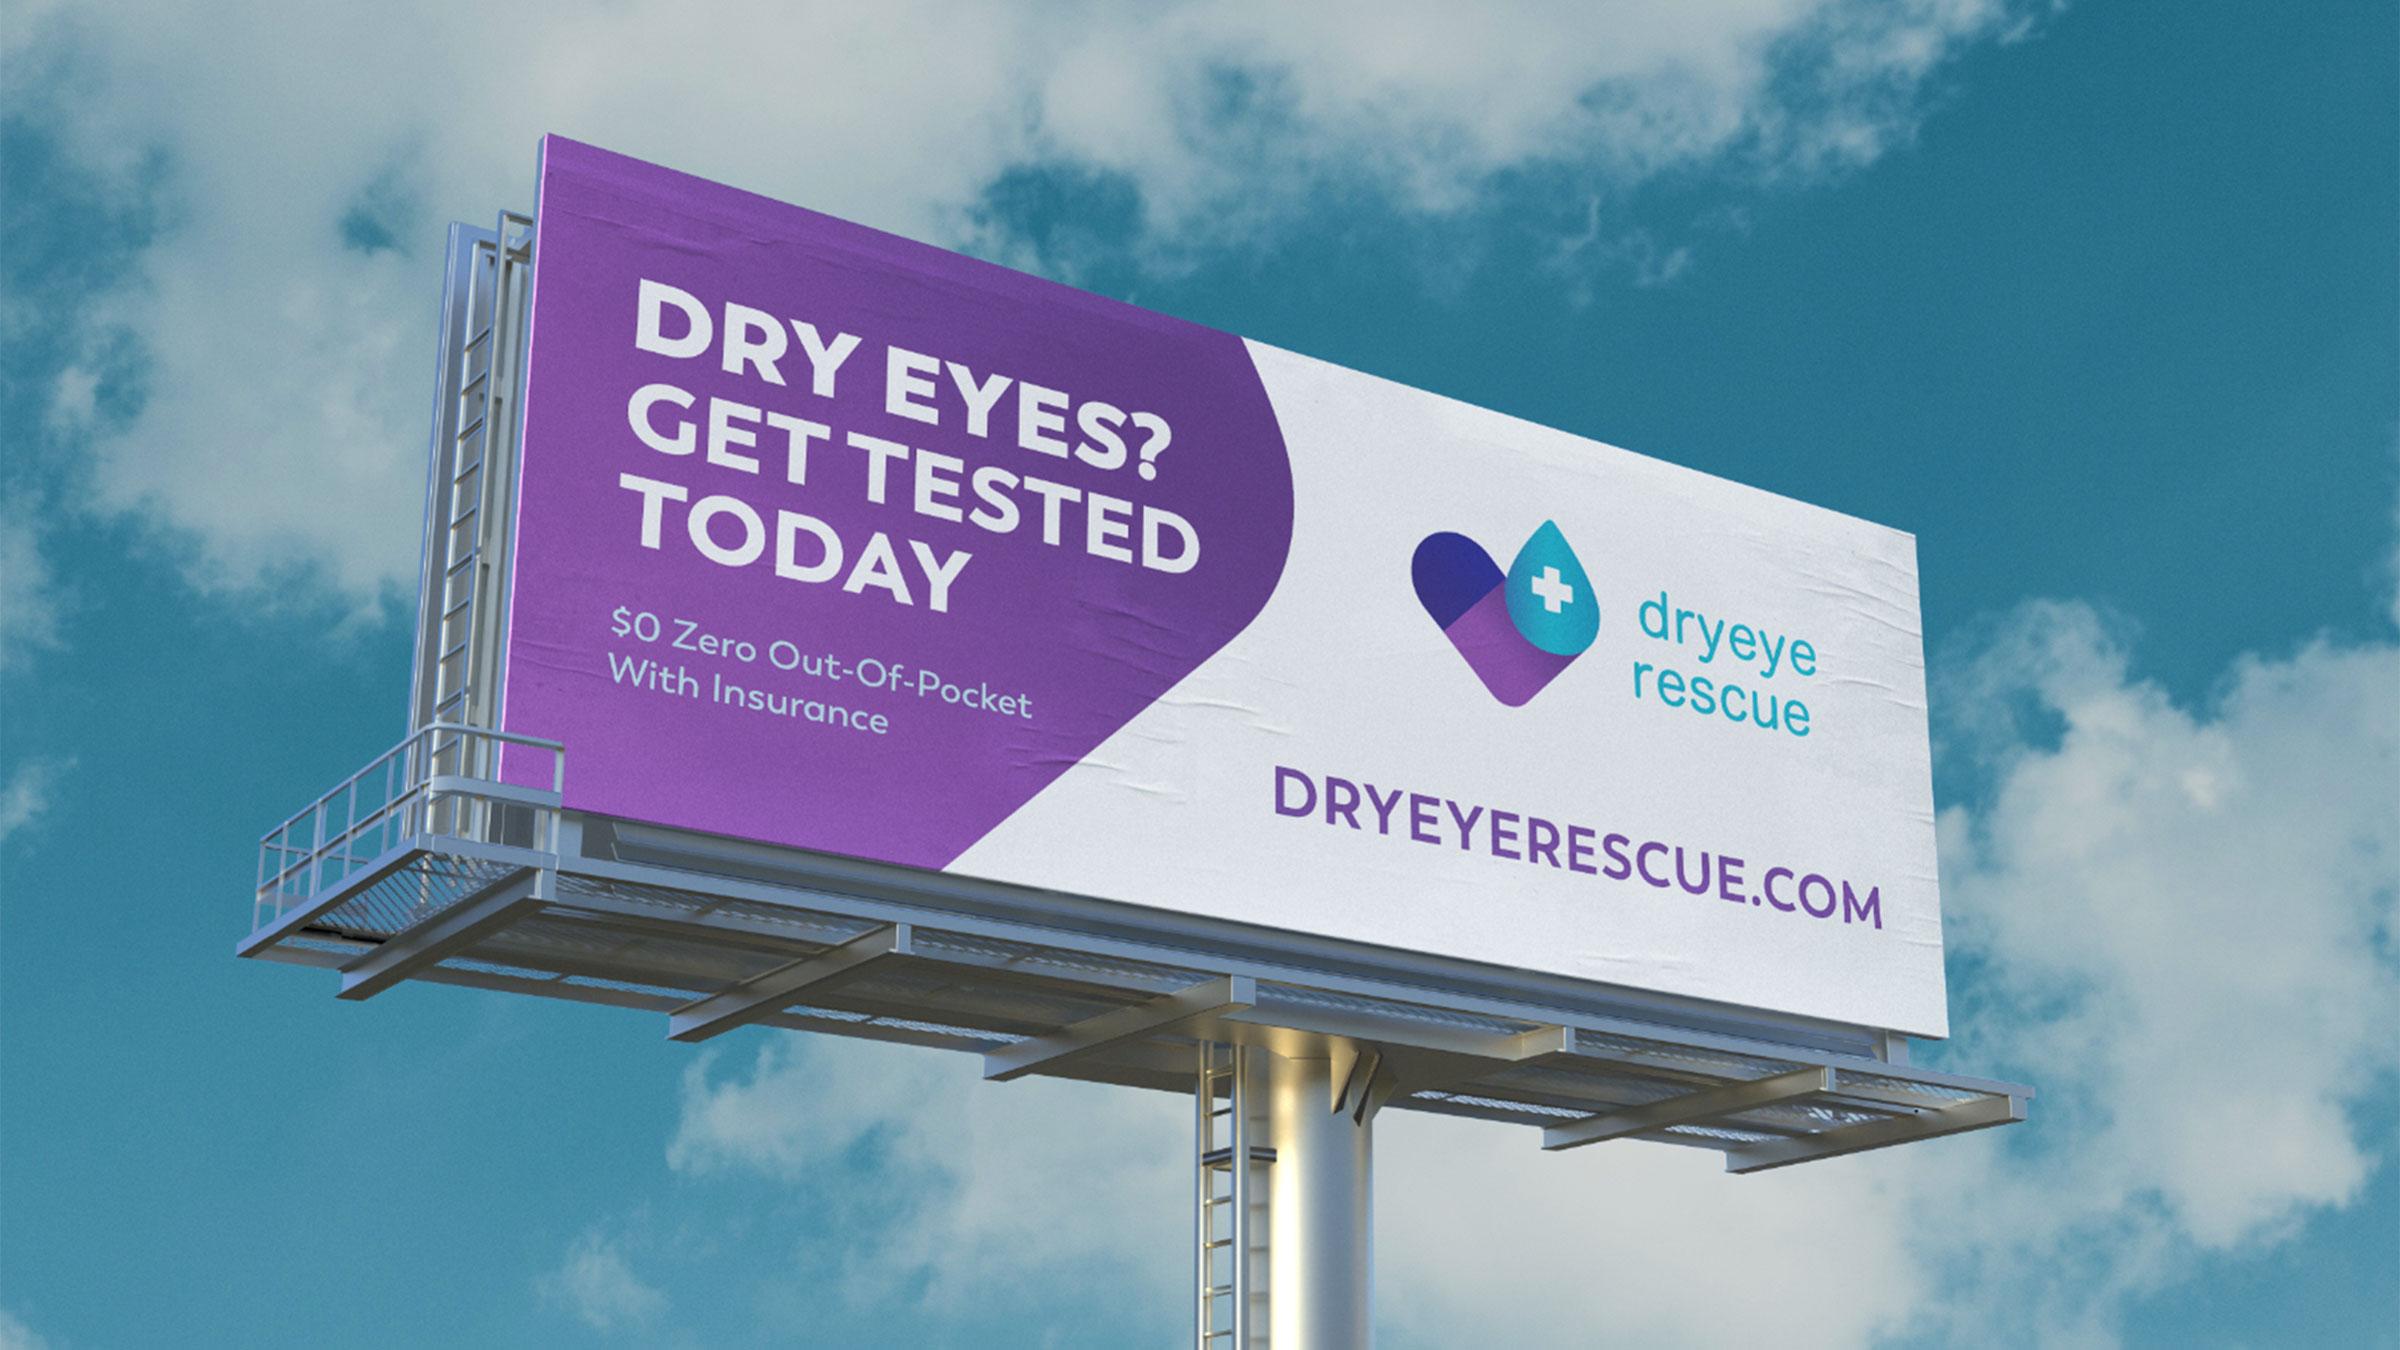 dryeye rescue billboard